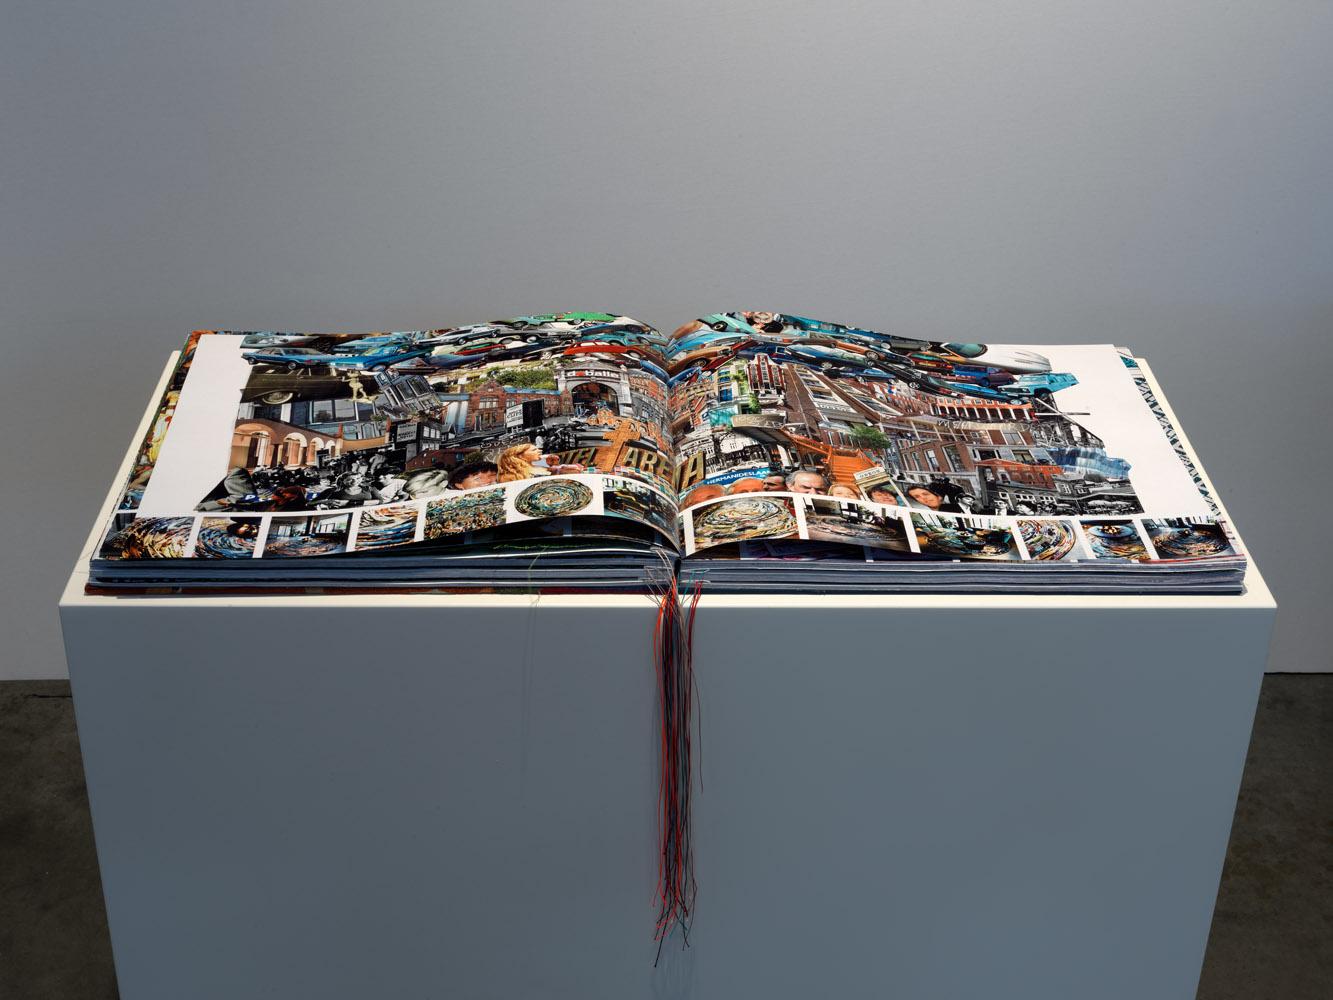 022.B.BROEKMAN-ART ON PAPER 2019-PH.GJ.vanROOIJ.jpg